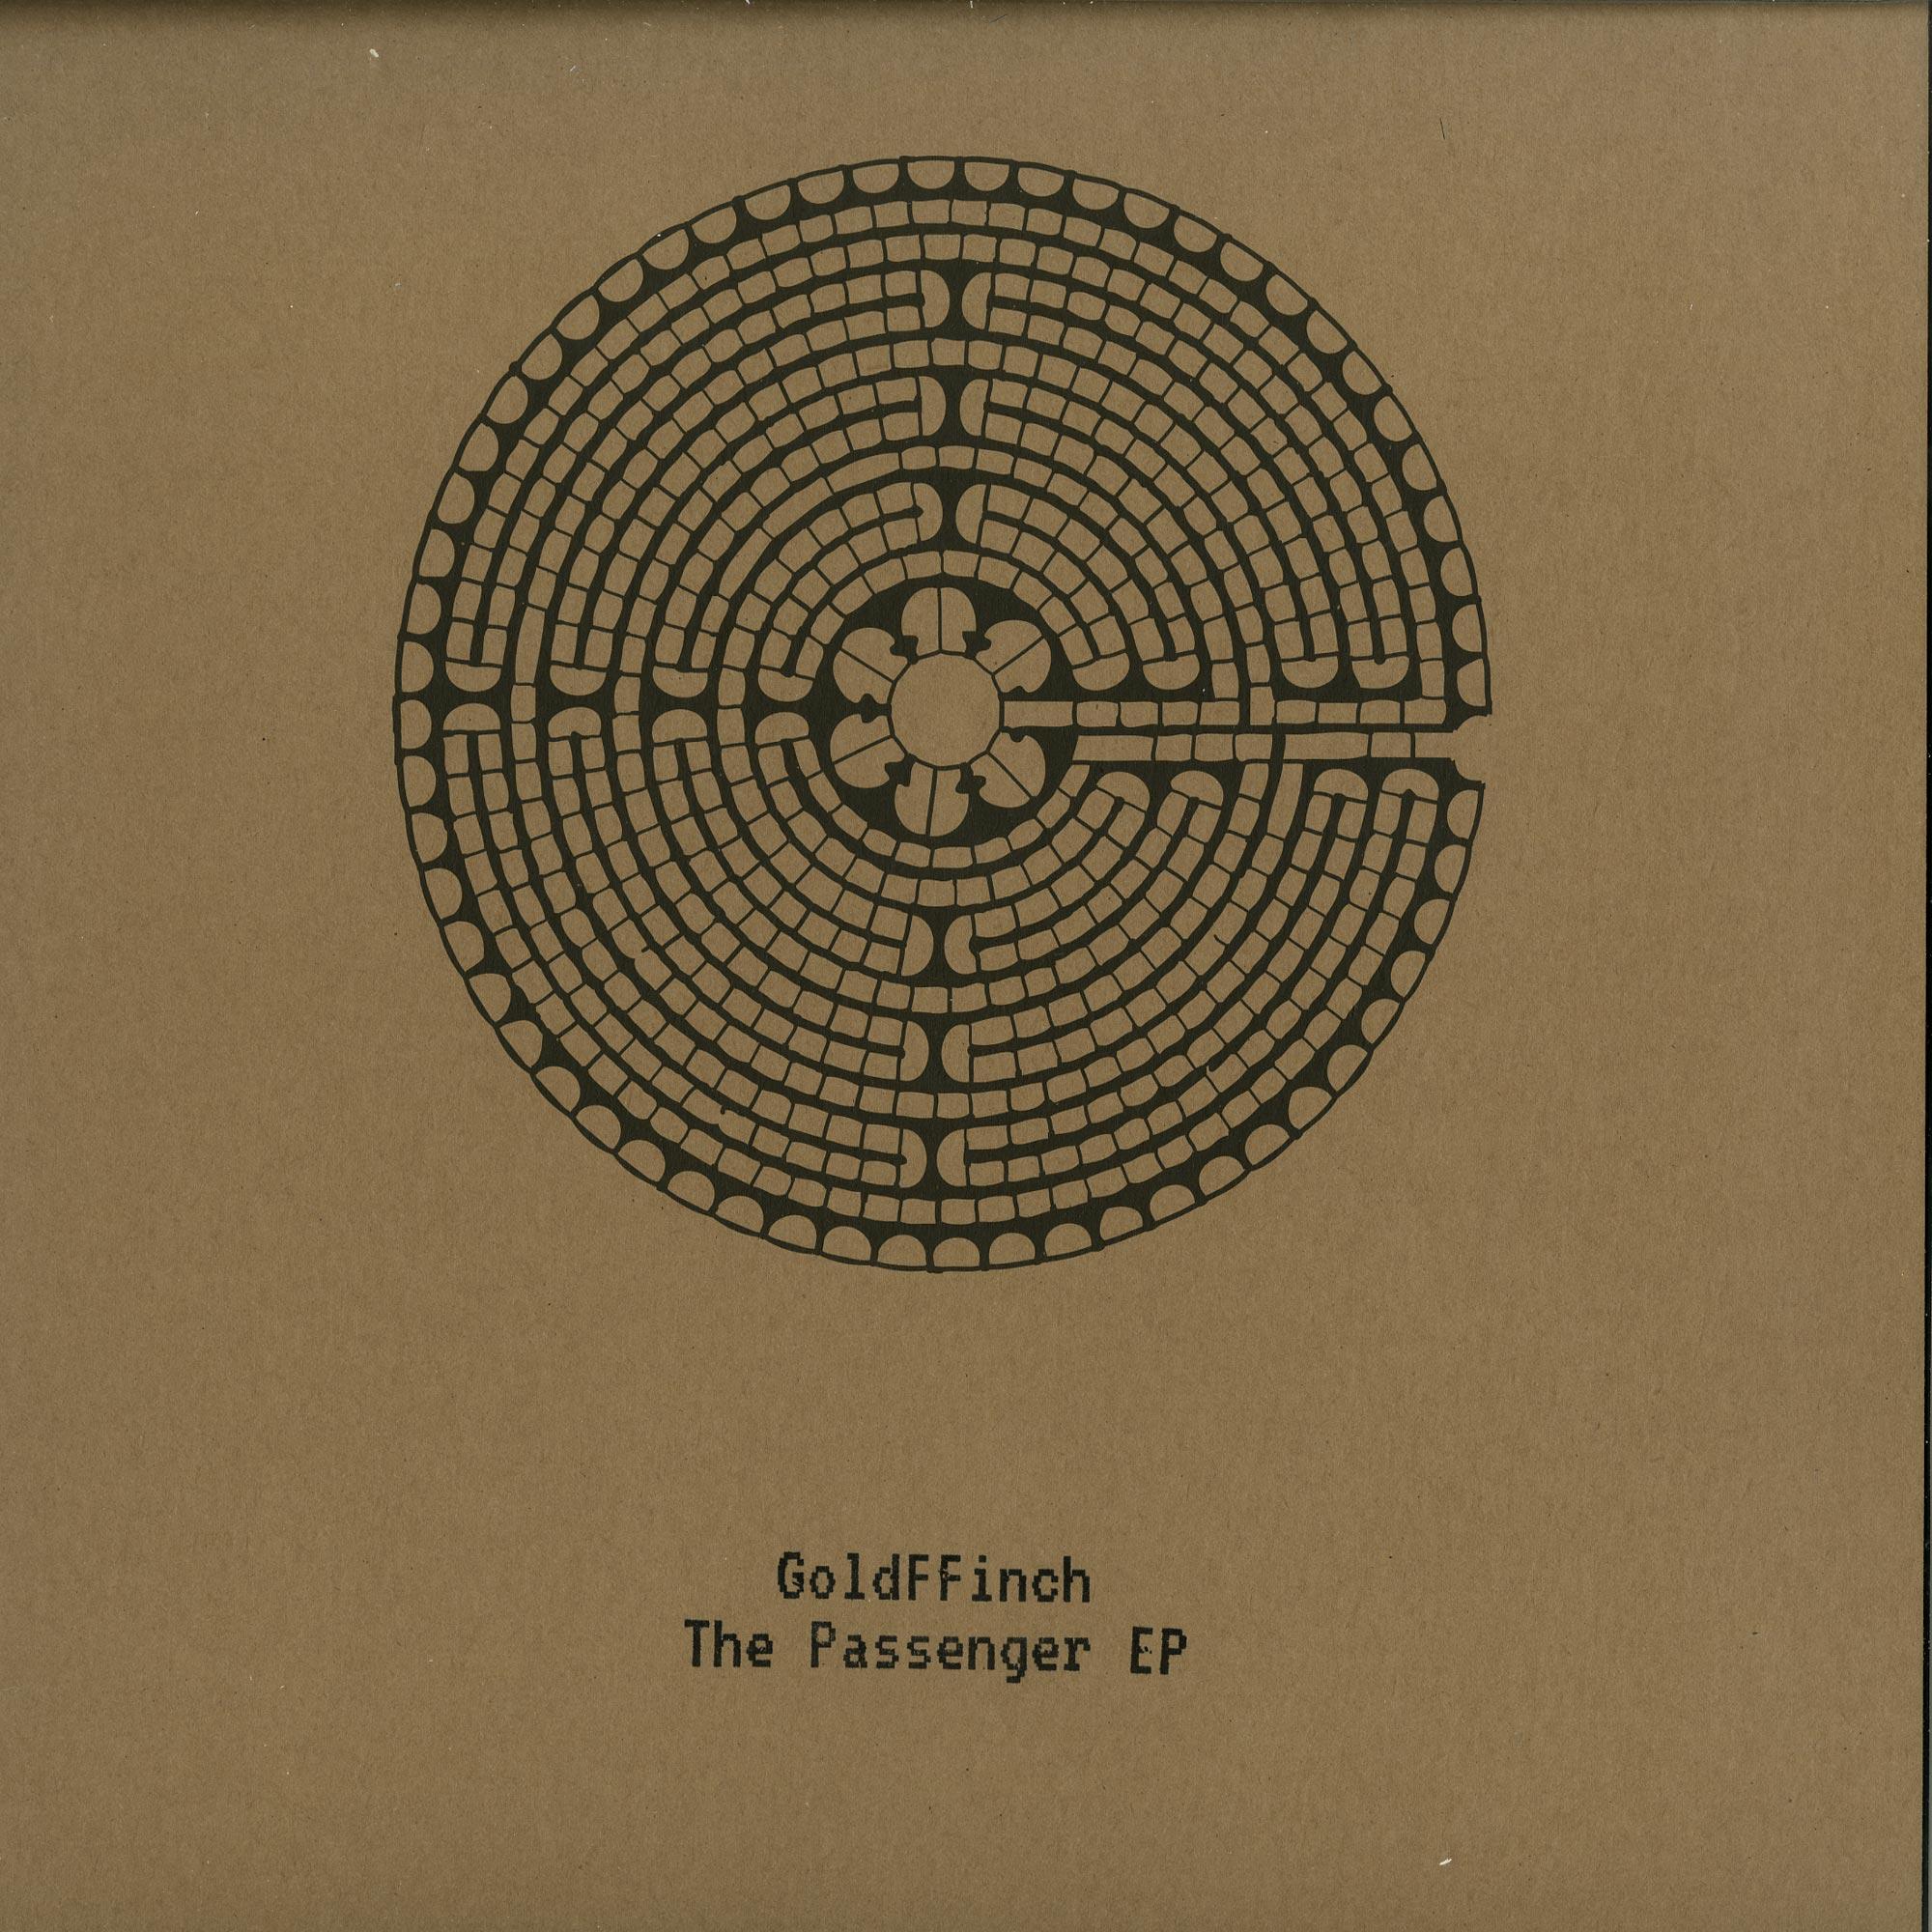 Goldffinch - THE PASSENGER EP